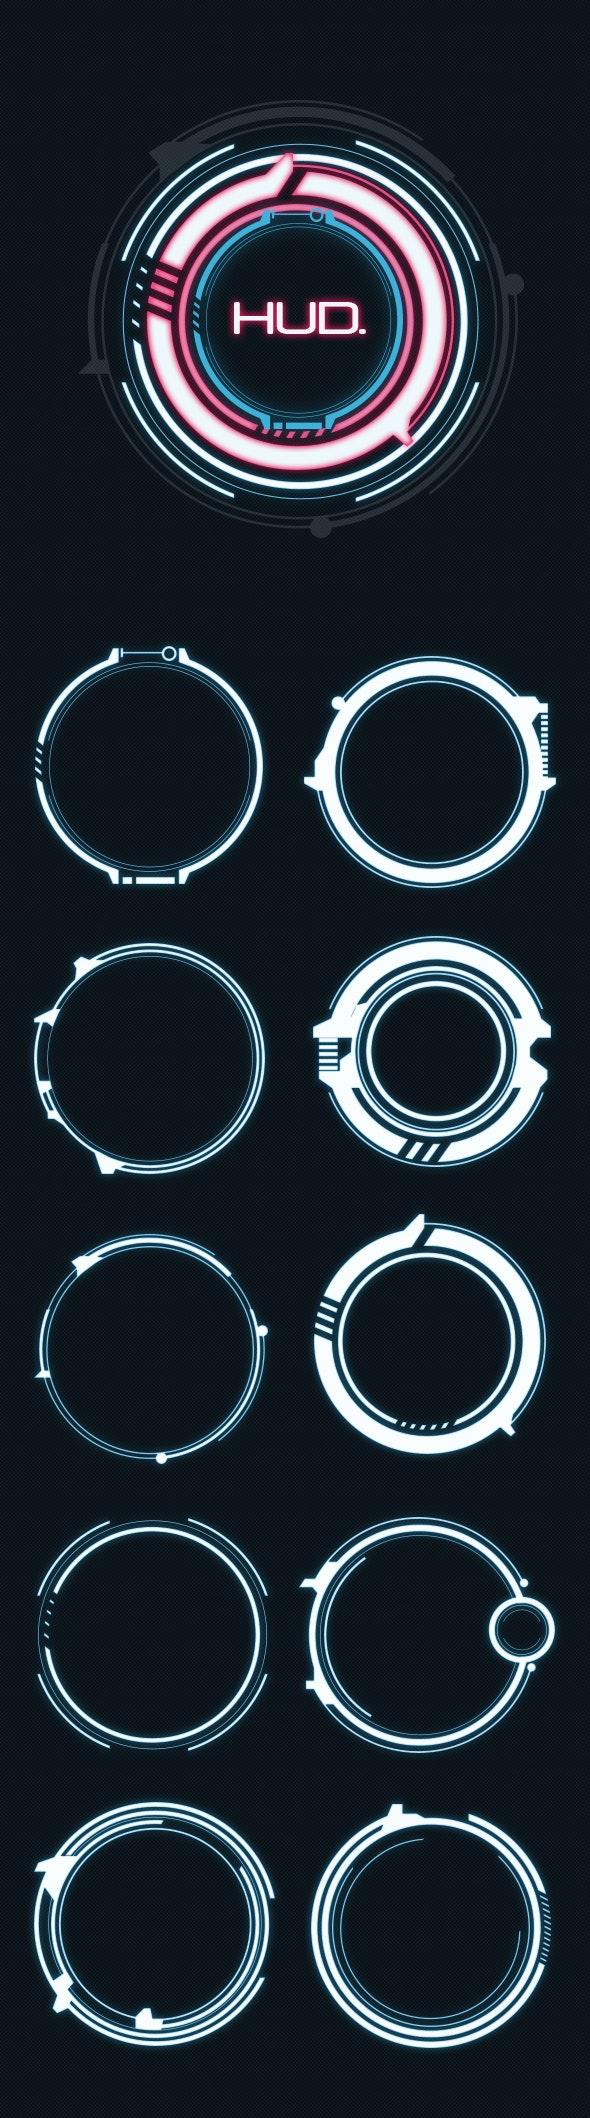 Hi-Tech Circles Custom Shapes - Shapes Photoshop